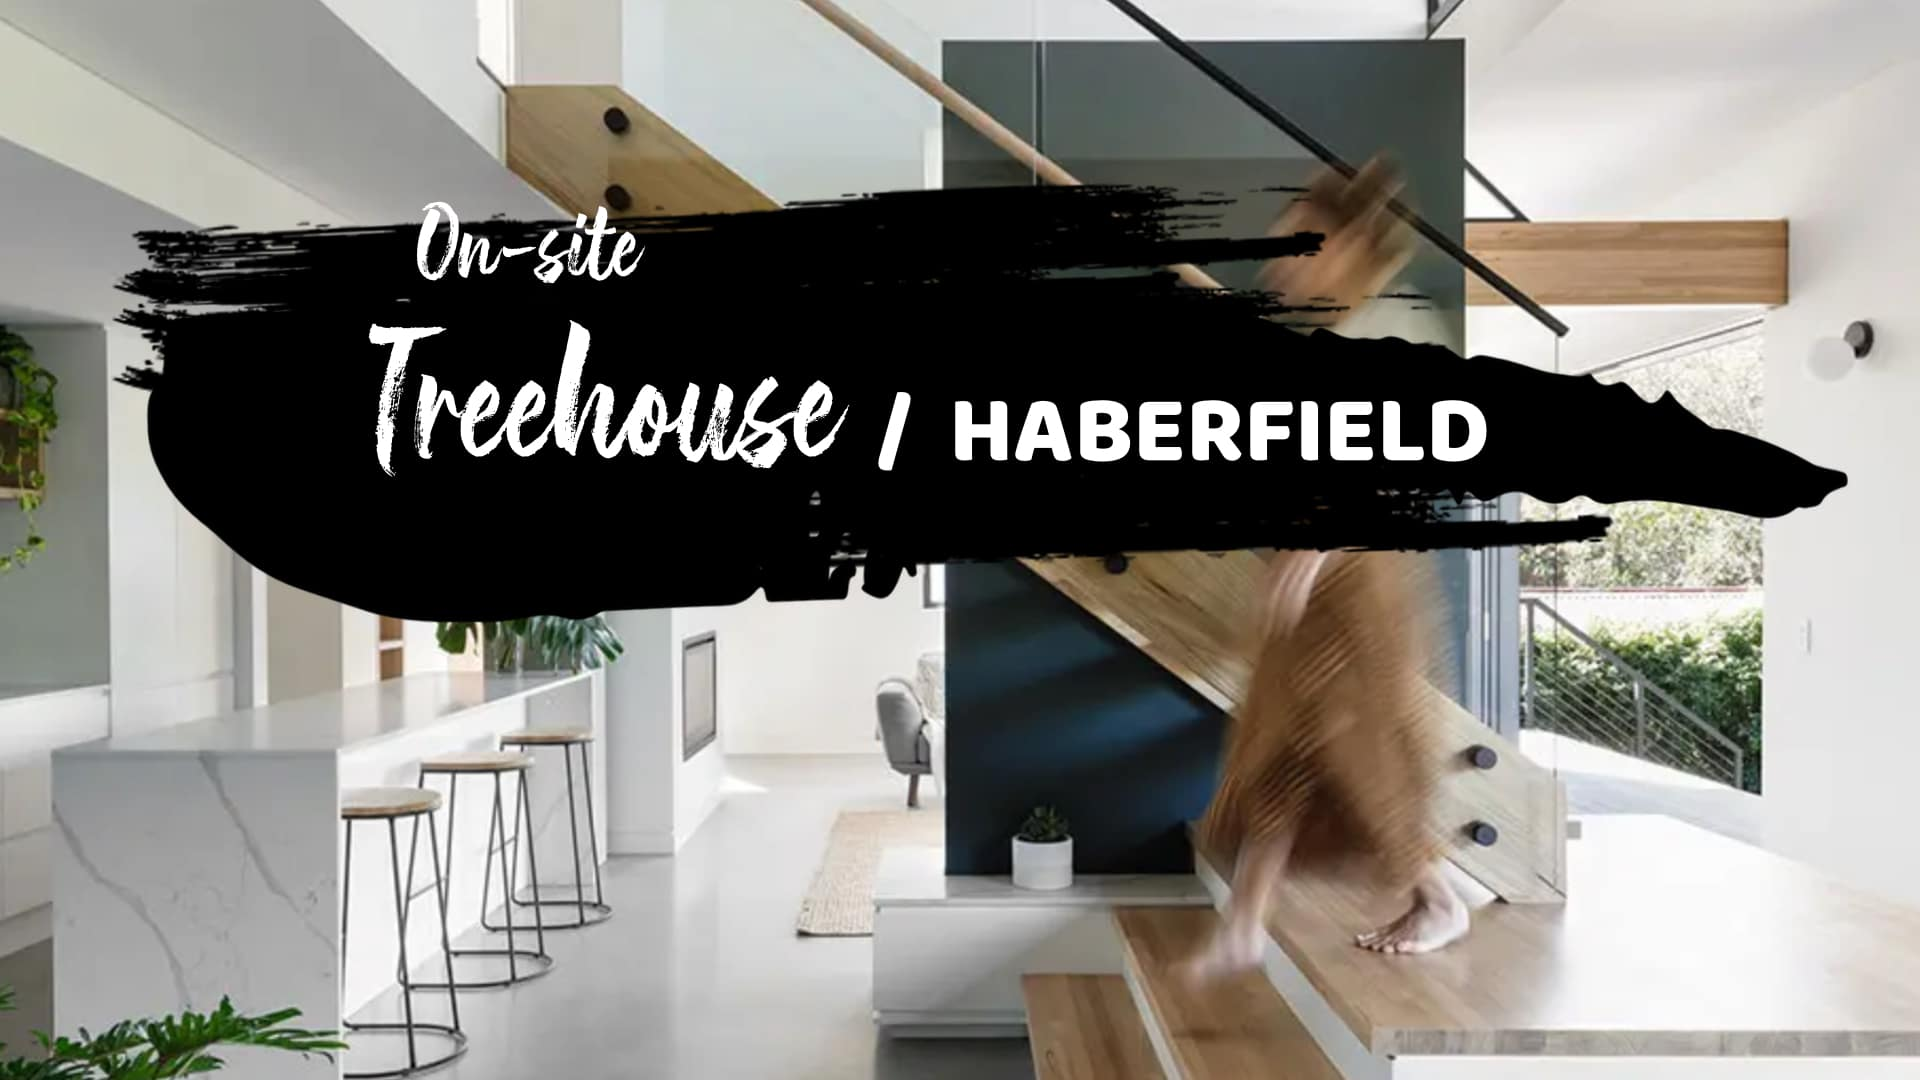 TREEHOUSE, HABERFIELD